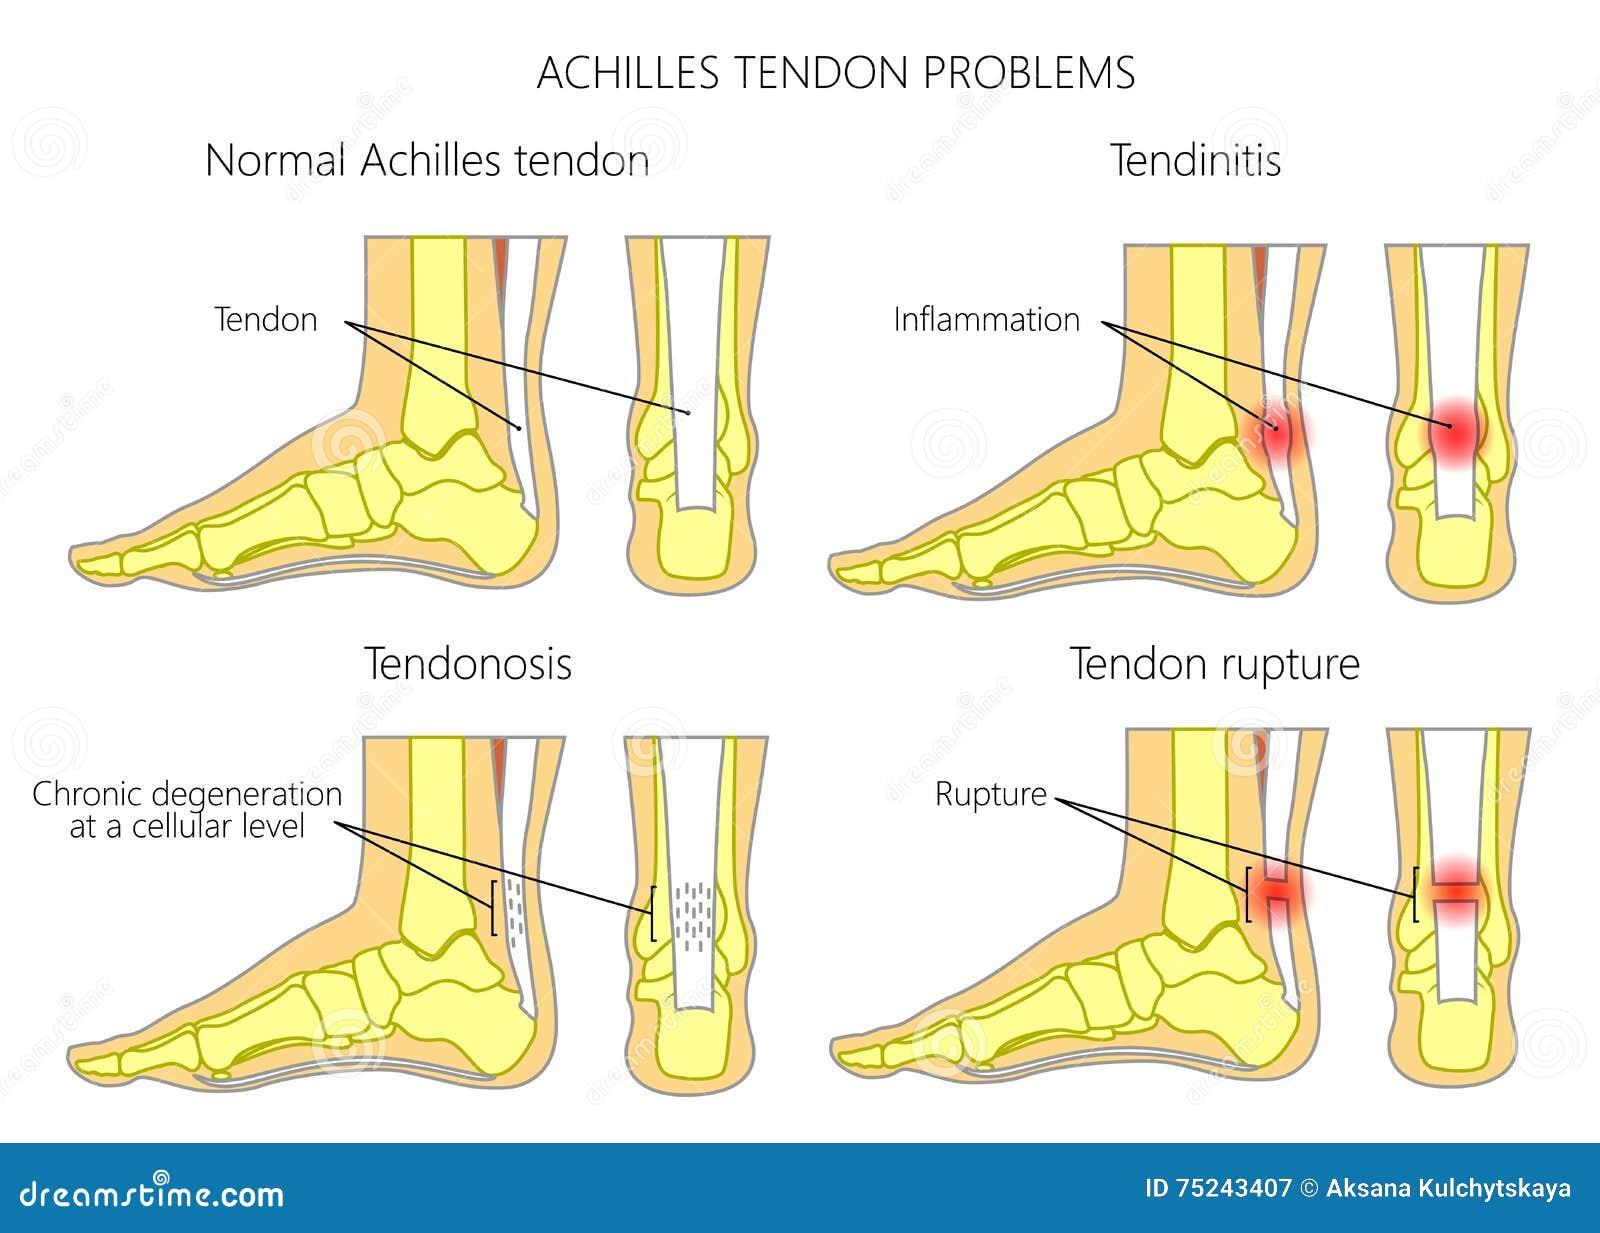 Achilles tendon injures